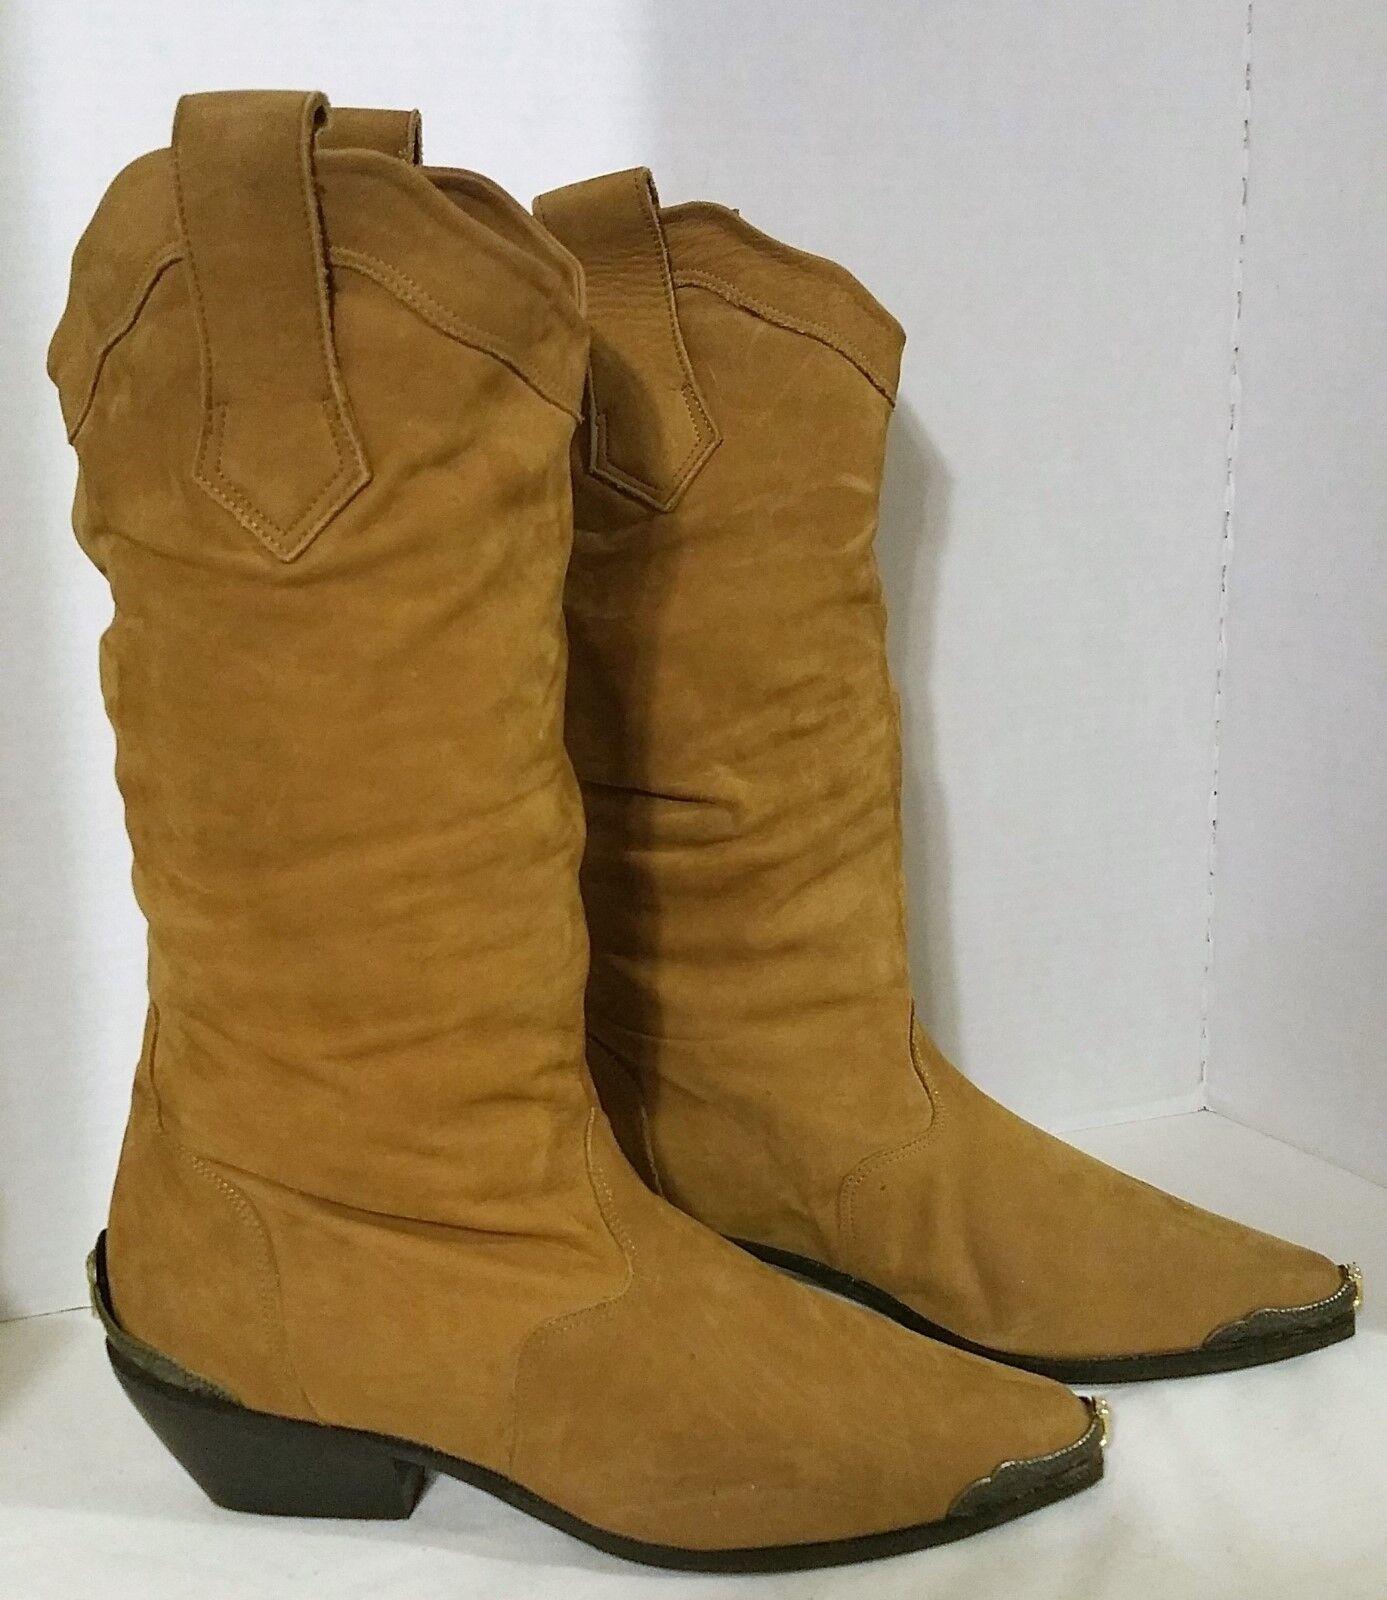 Maine Woods,Tonto Women's Cowboy Boots,LU29NC,Leather, w Metal Eagle on toe heel